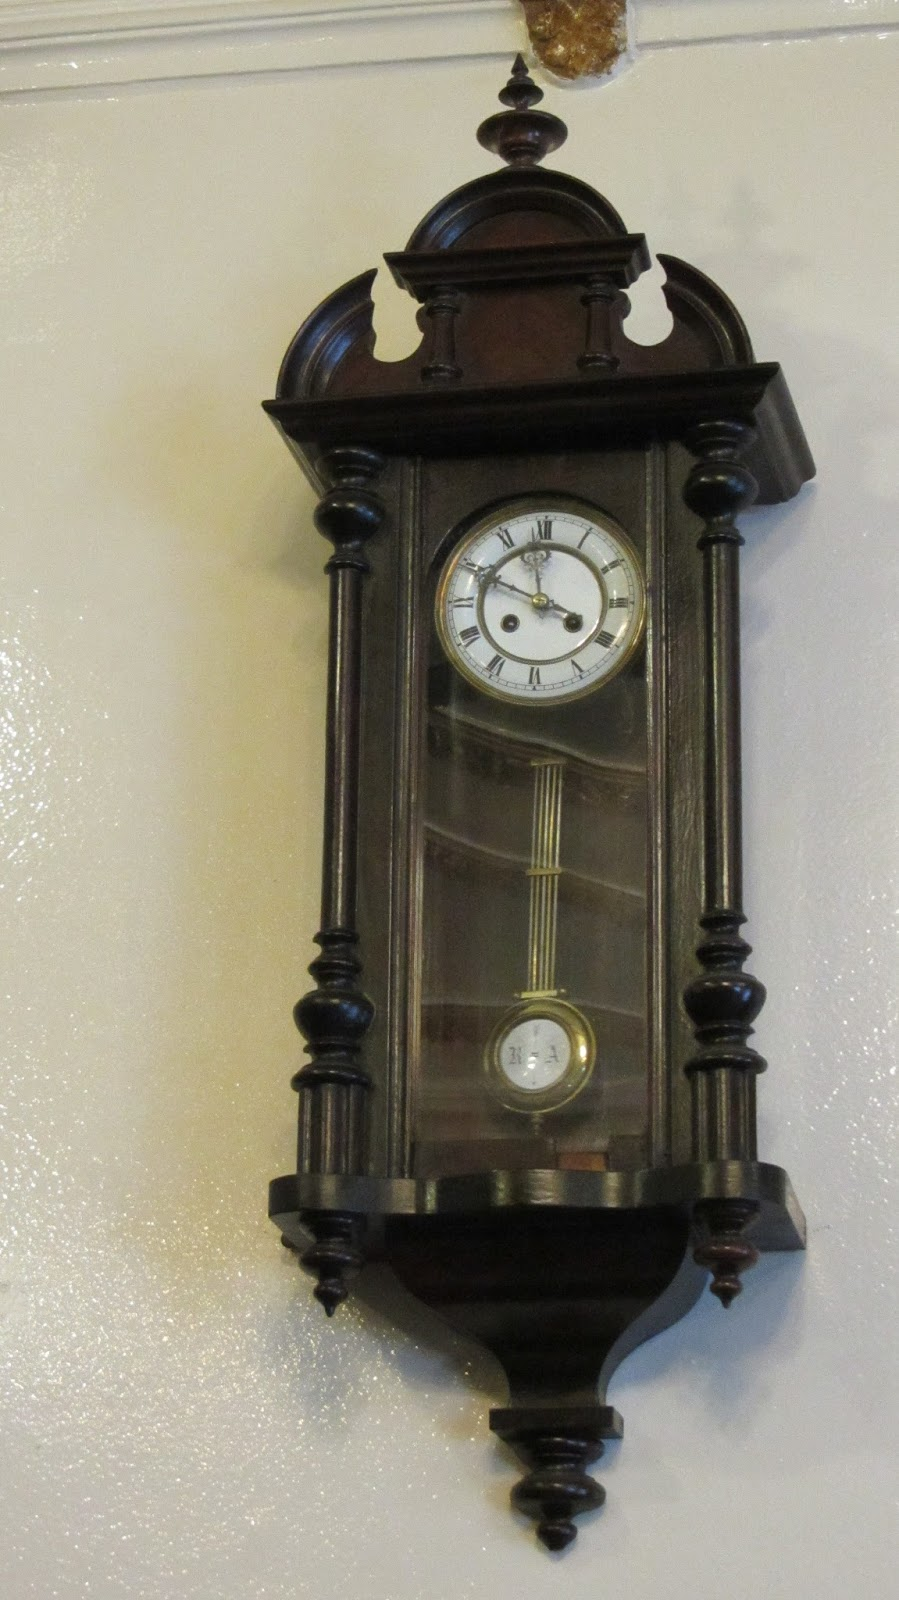 Madridmetropolis detalles de madrid la otra colecci n de relojes de madrid - Reloj de pared gigante ...